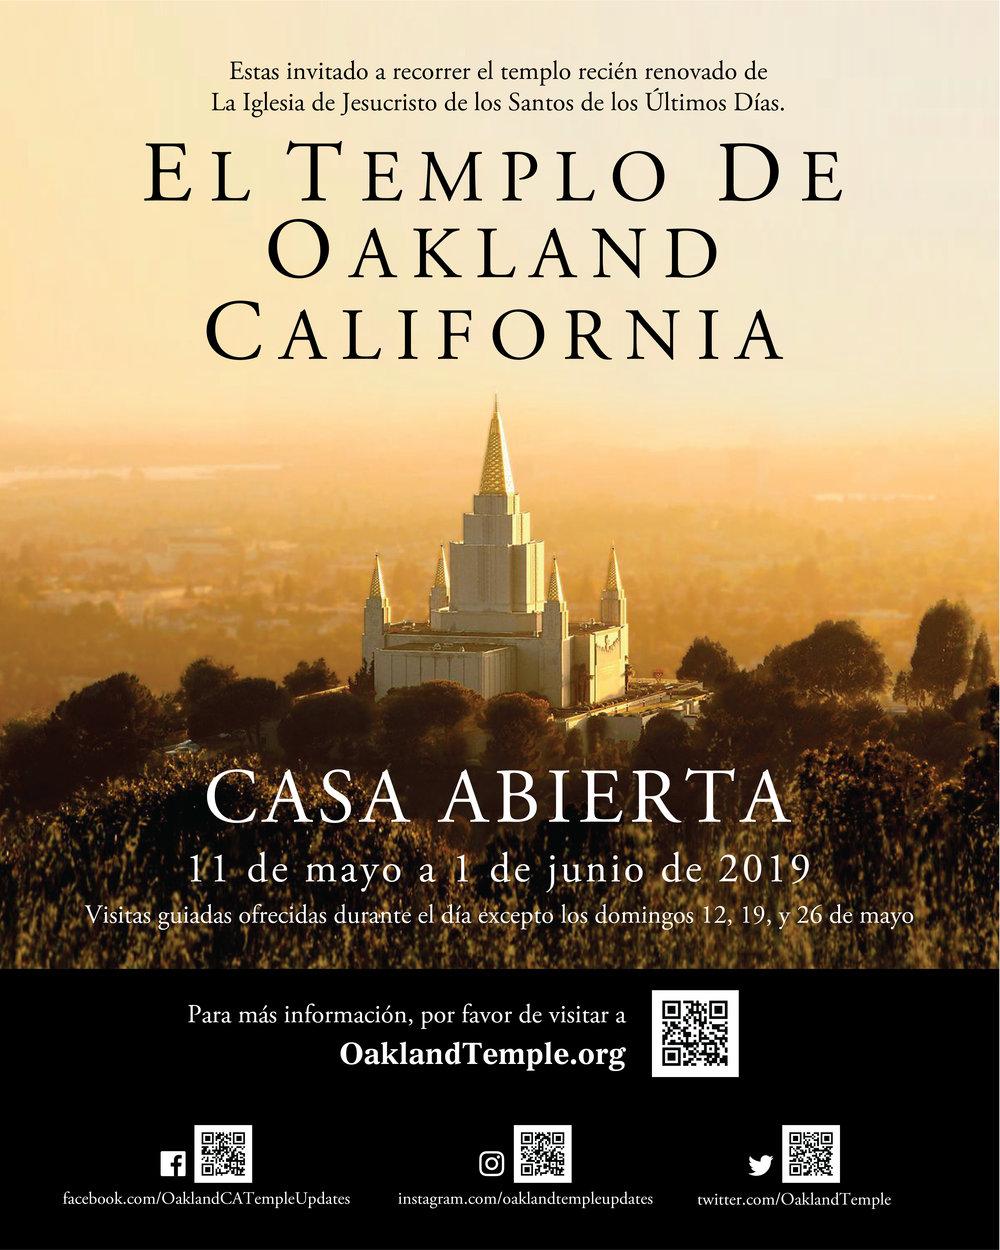 esp-oakland-temple-open-house-poster-01.jpg